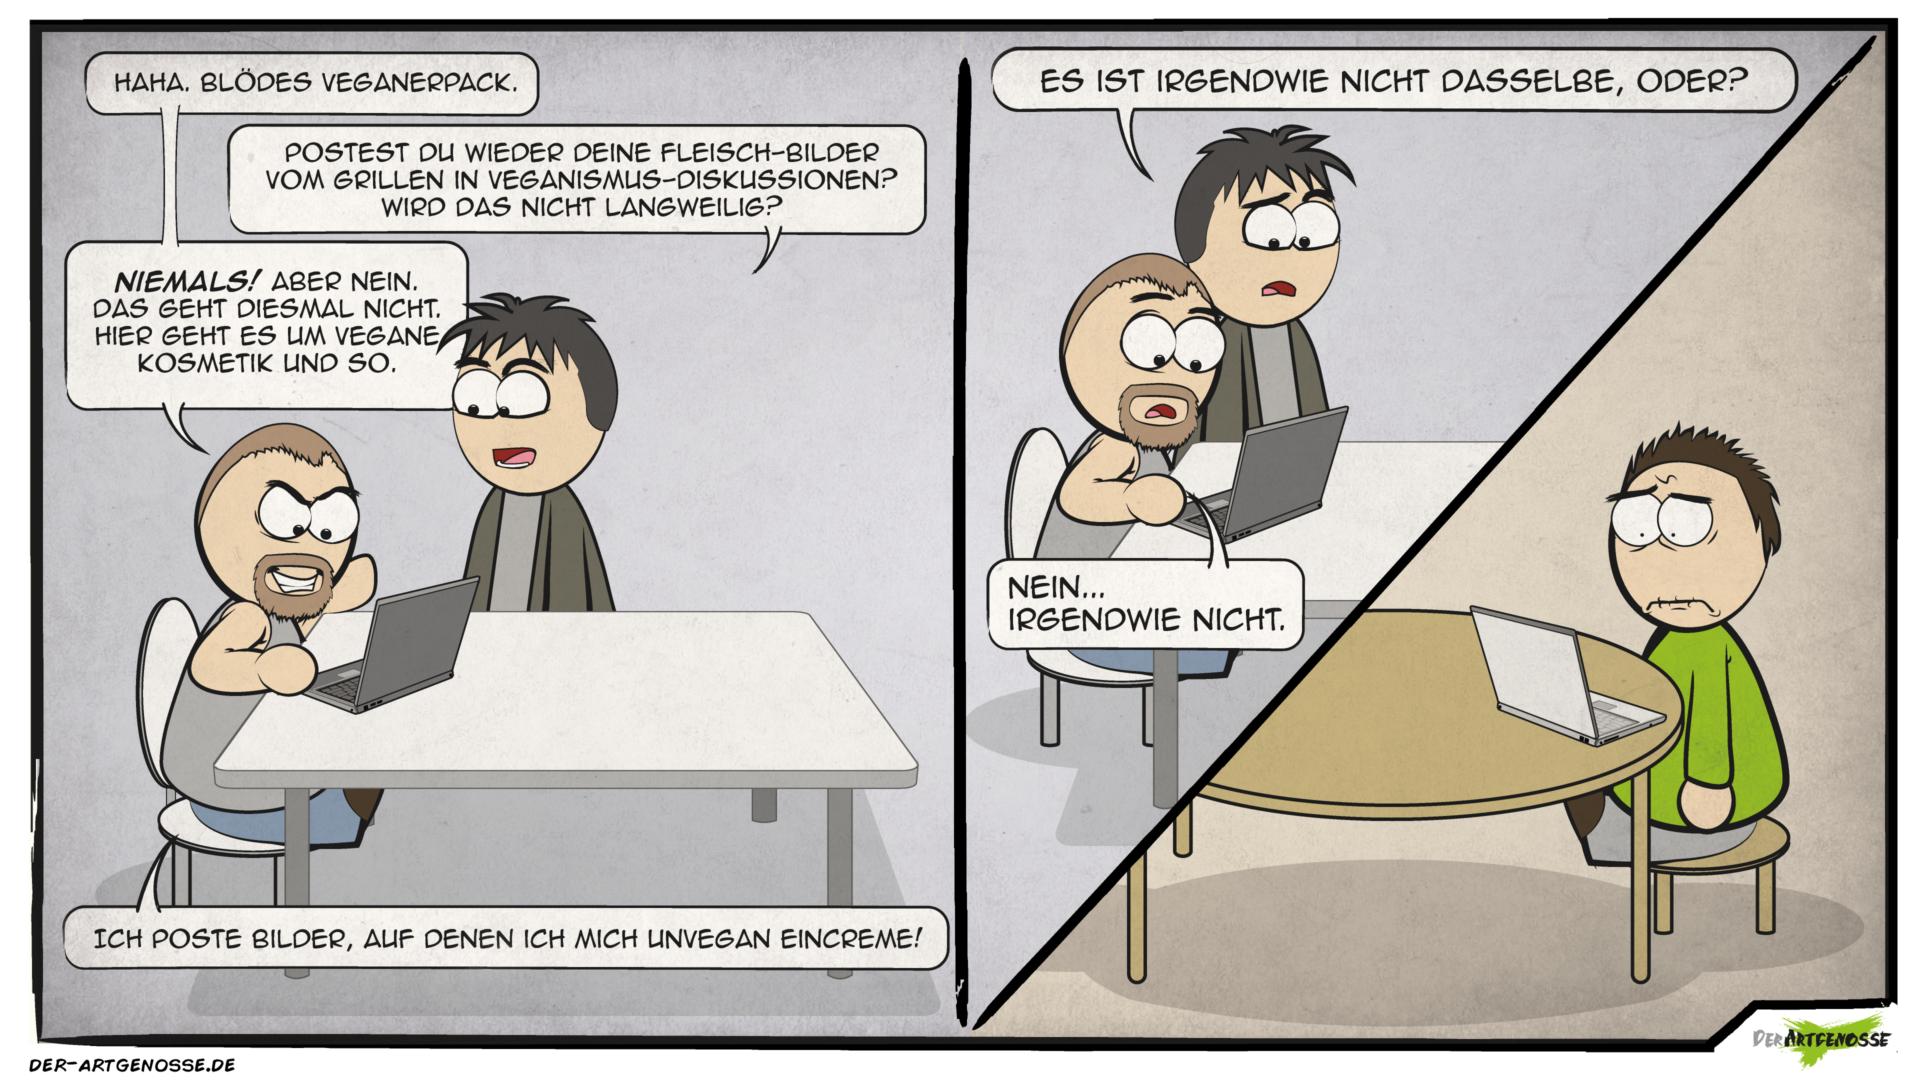 vegan Comic: cremig